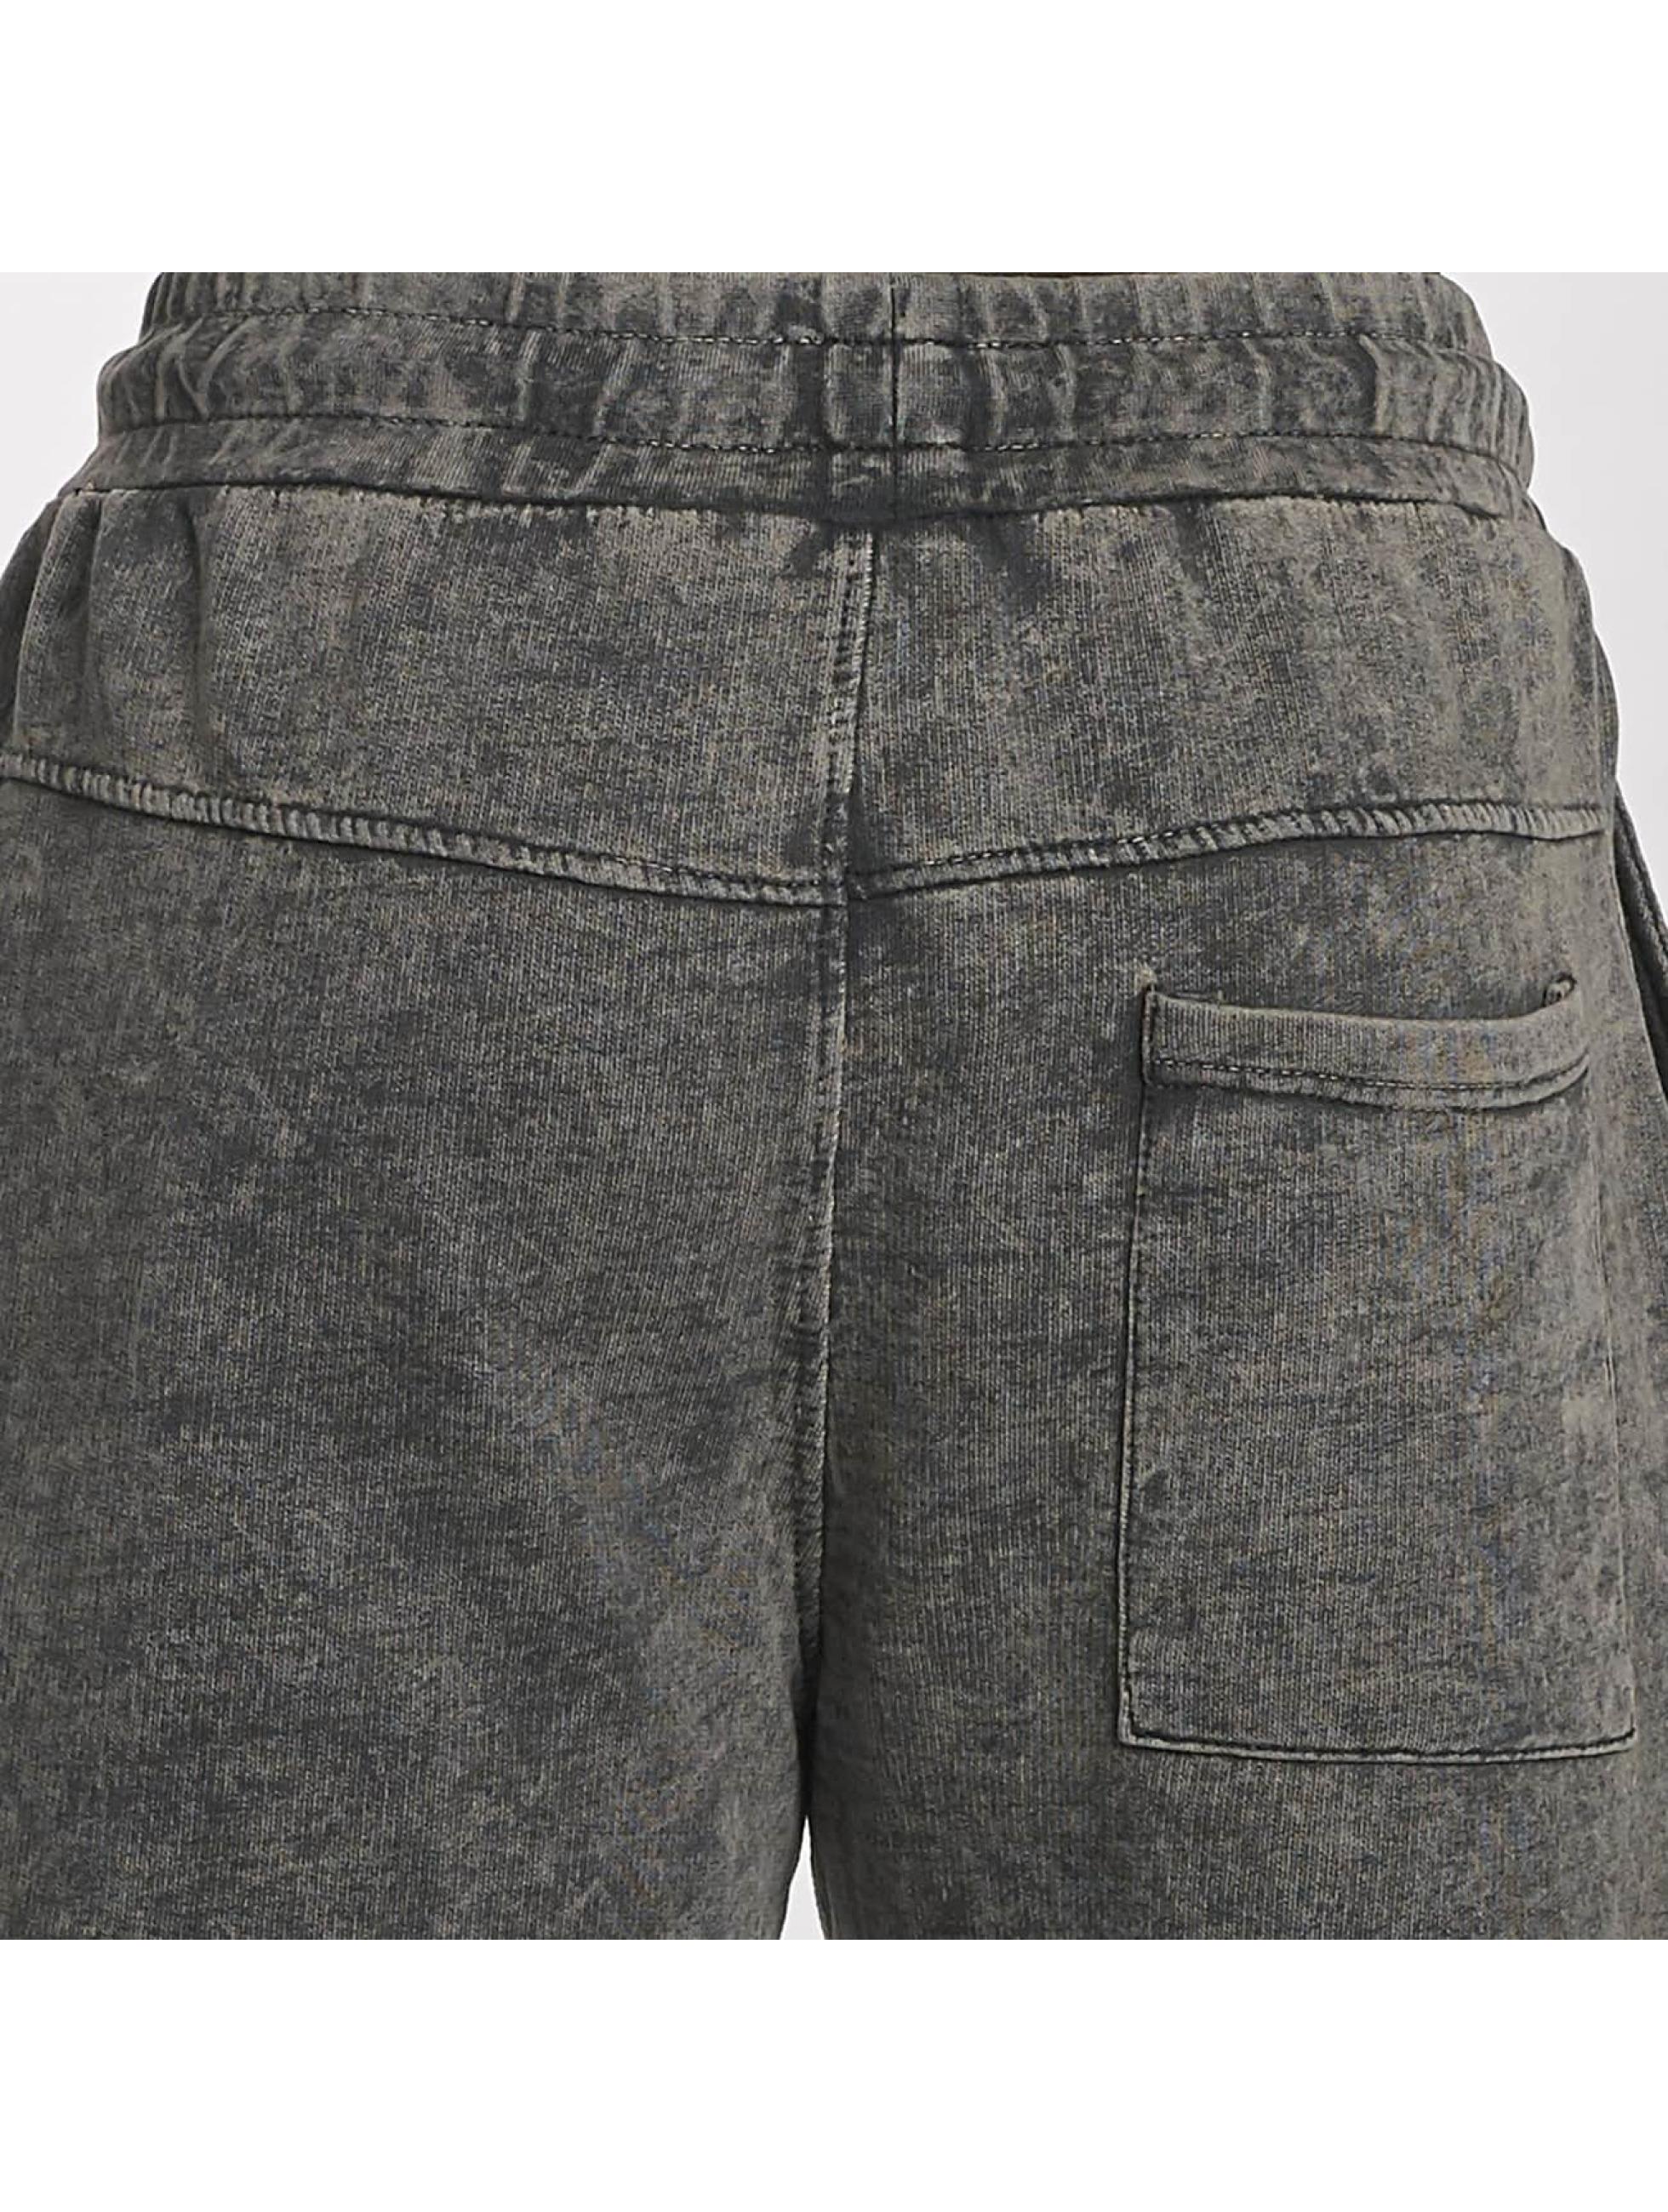 Urban Classics Shorts Vintage Terry grigio